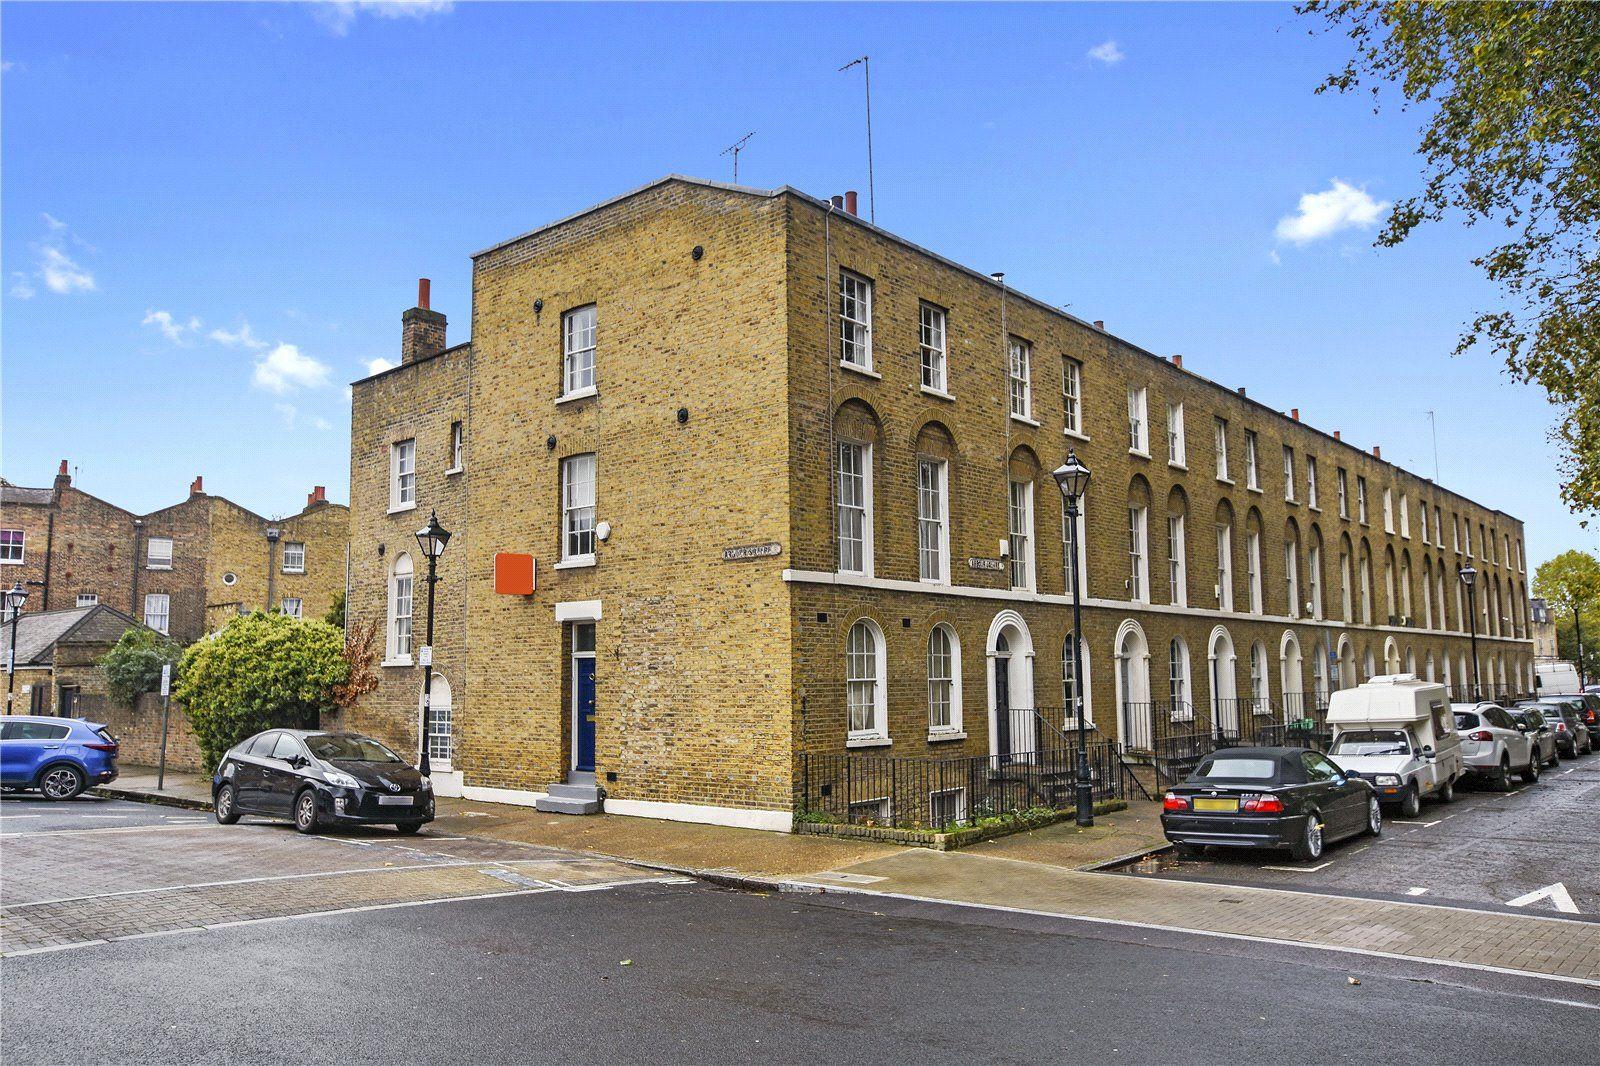 Property photo 1 of 11. Exterior